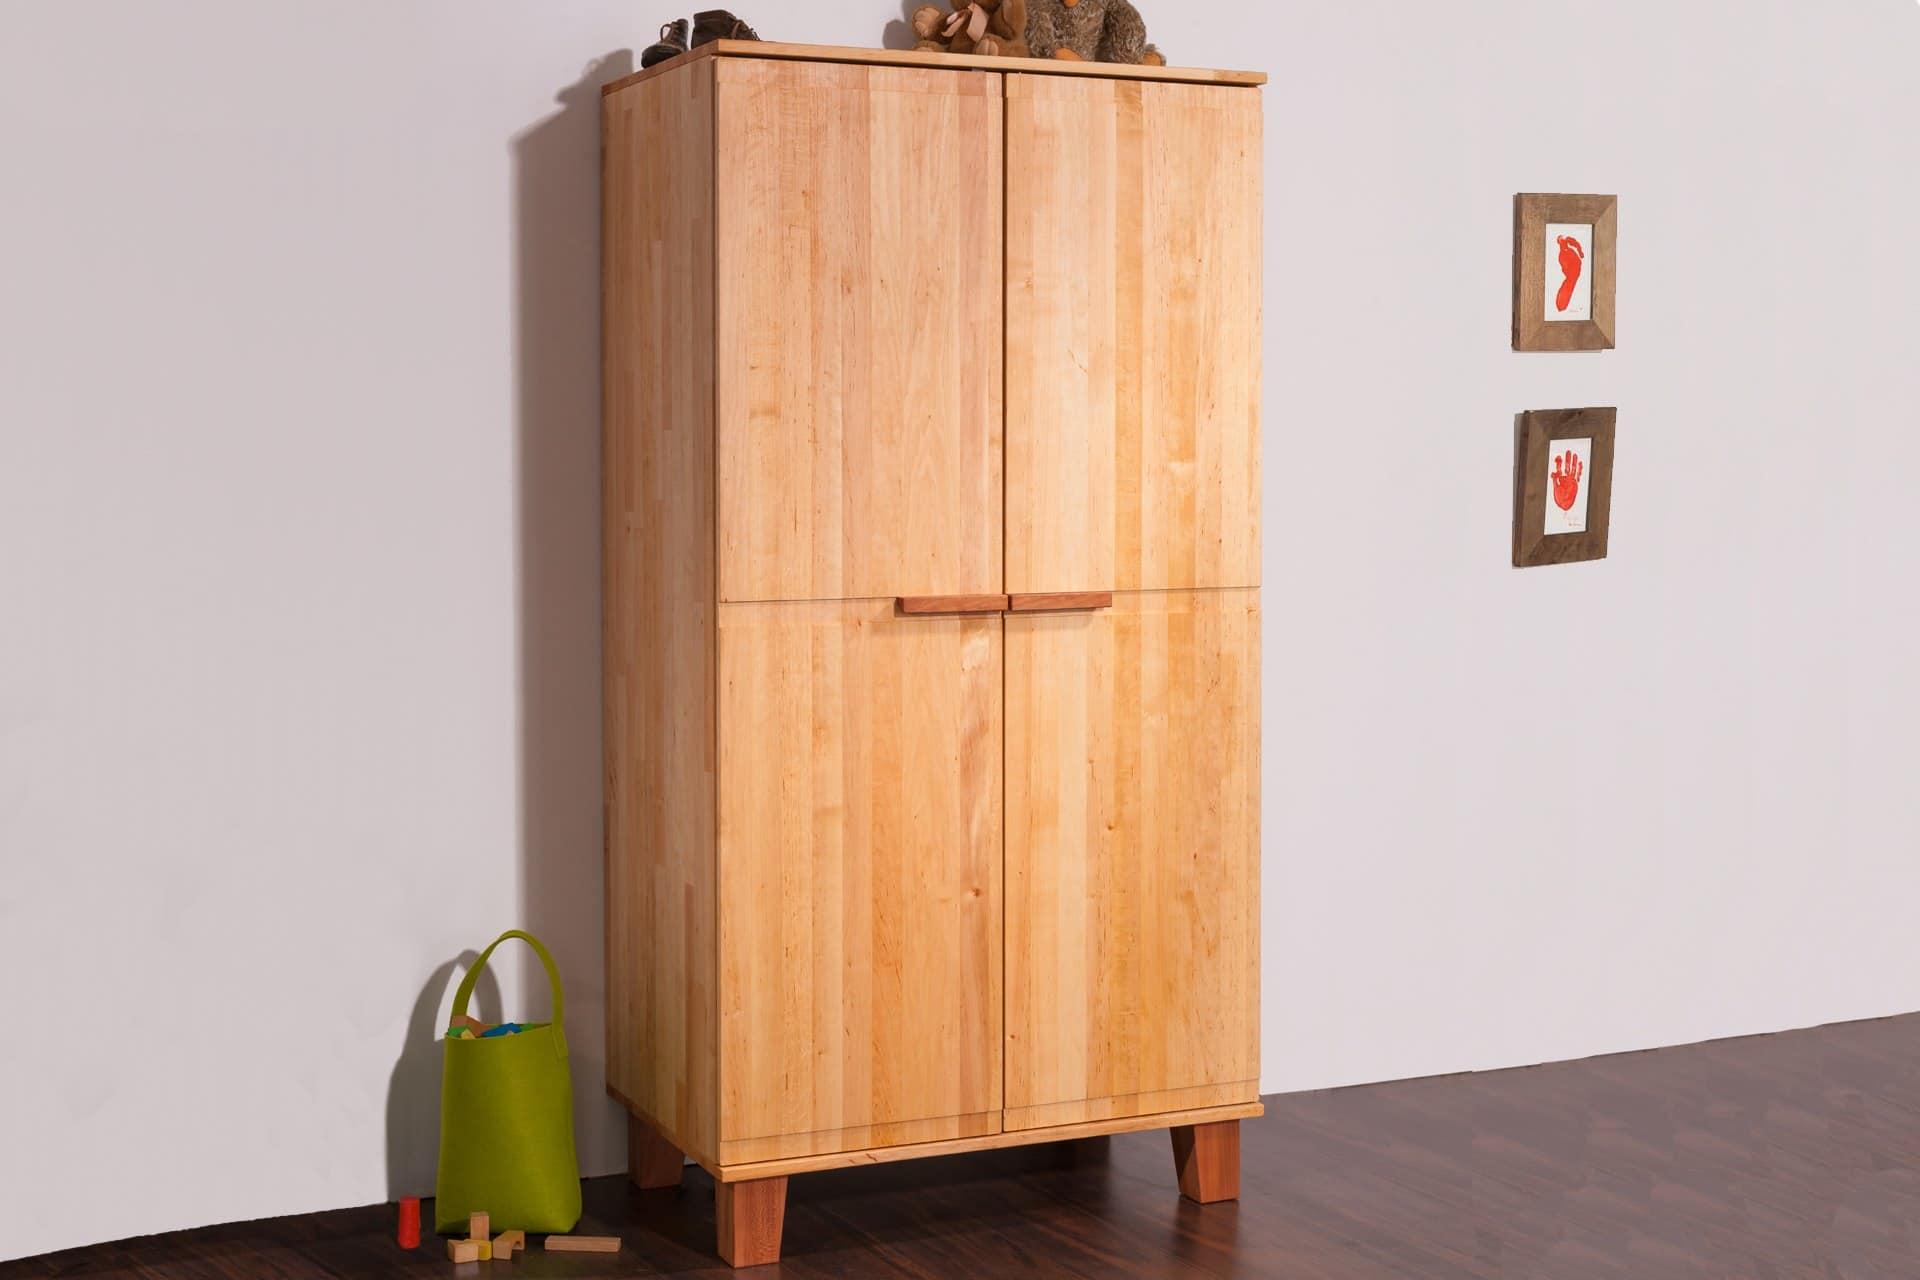 kleiderschrank benevita 2 t ren ko control. Black Bedroom Furniture Sets. Home Design Ideas